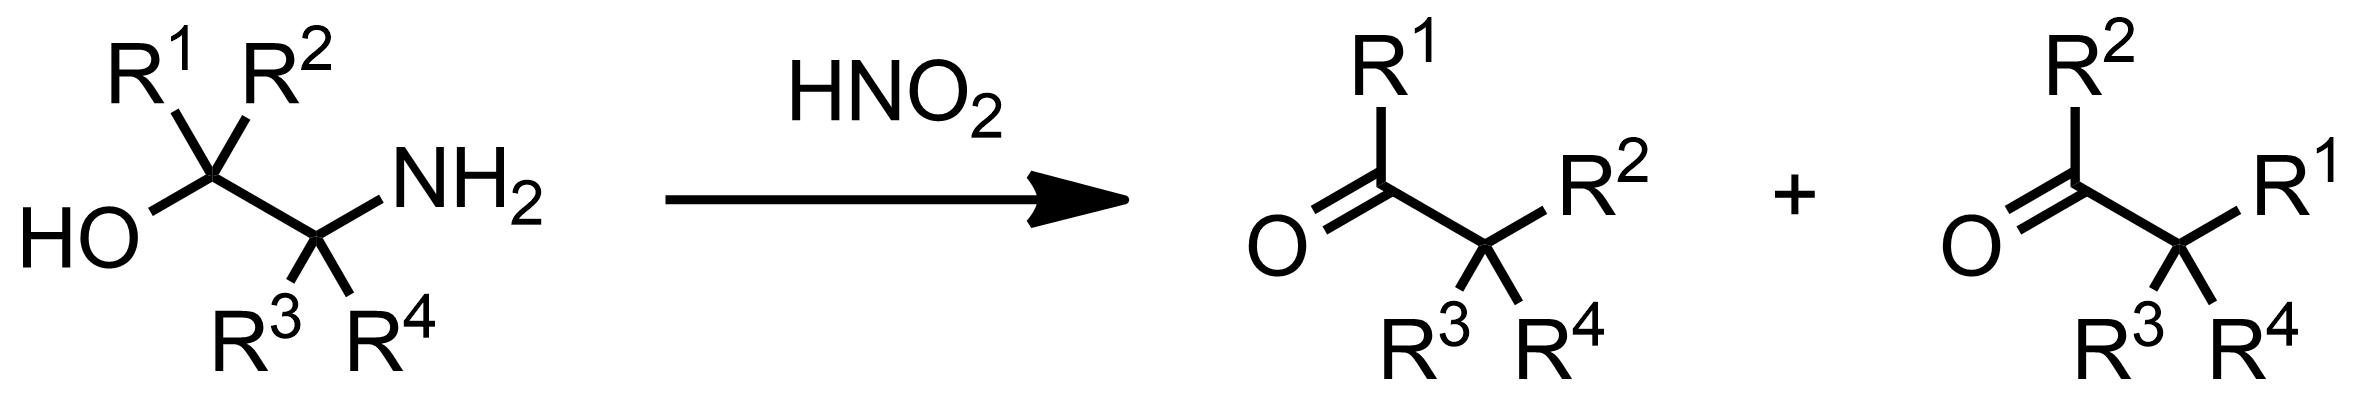 Schematic representation of the Tiffeneau-Demjanov Rearrangement.